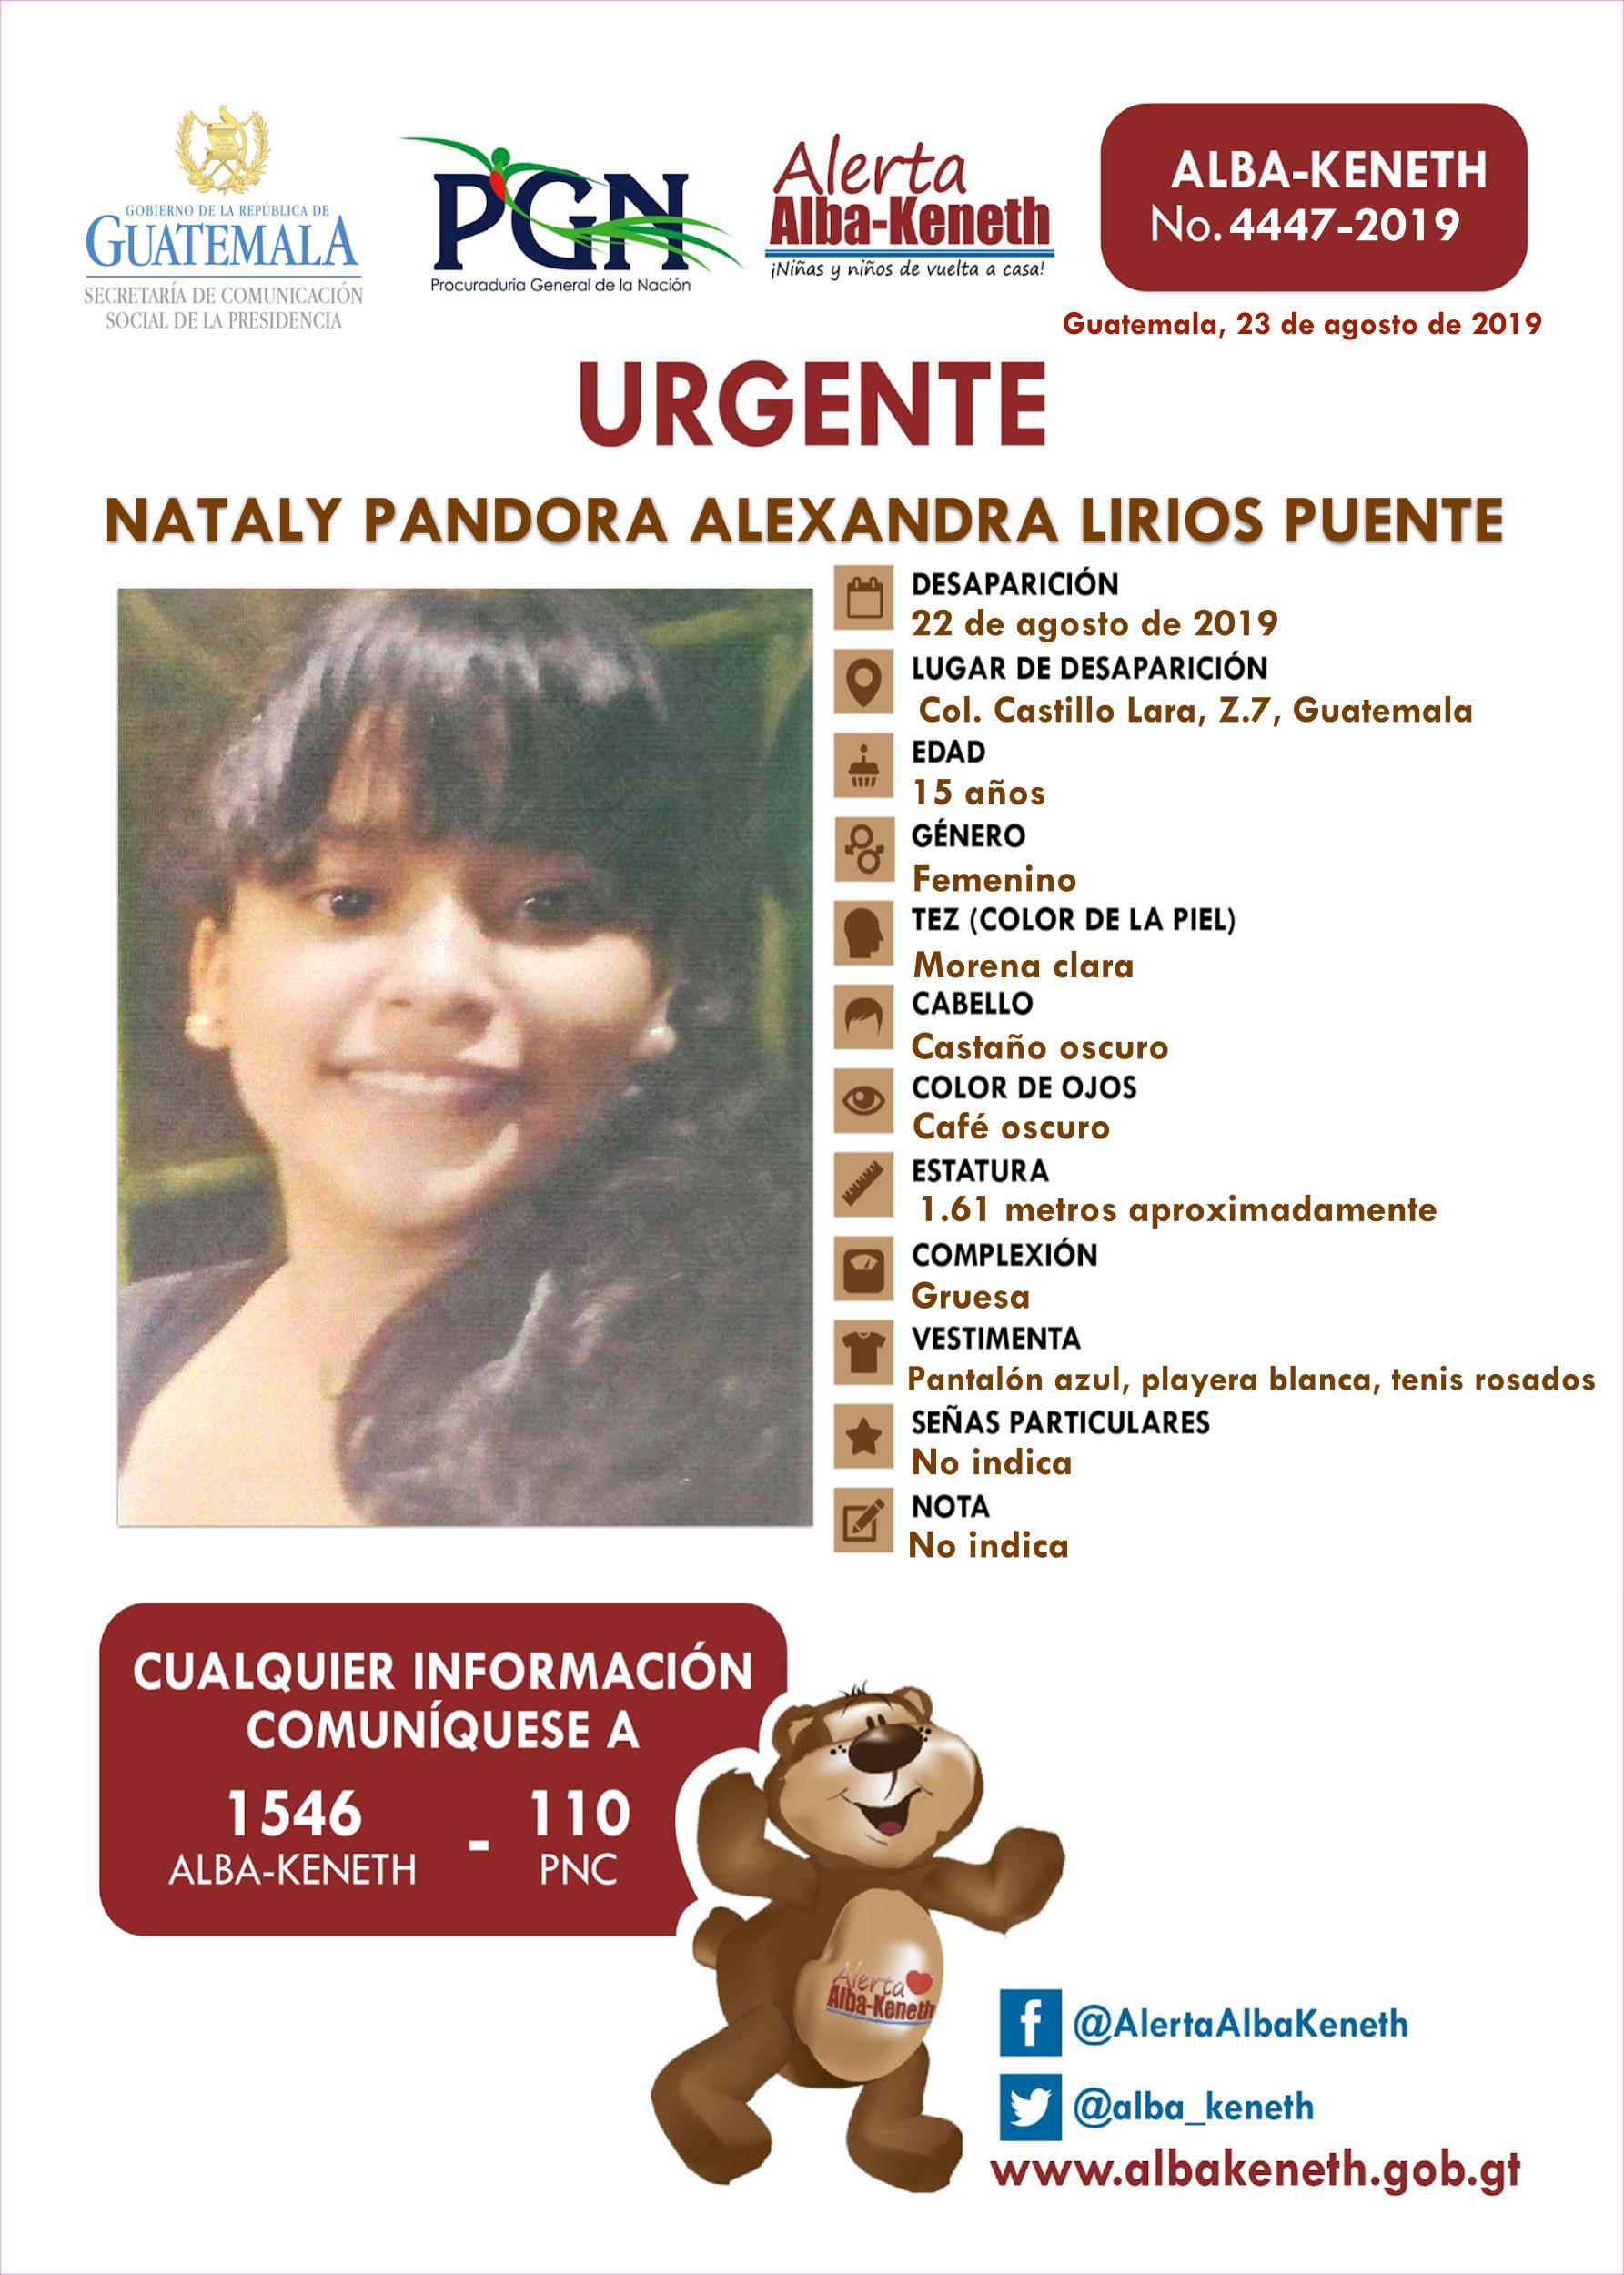 Nataly Pandora Alexandra Lirios Puente